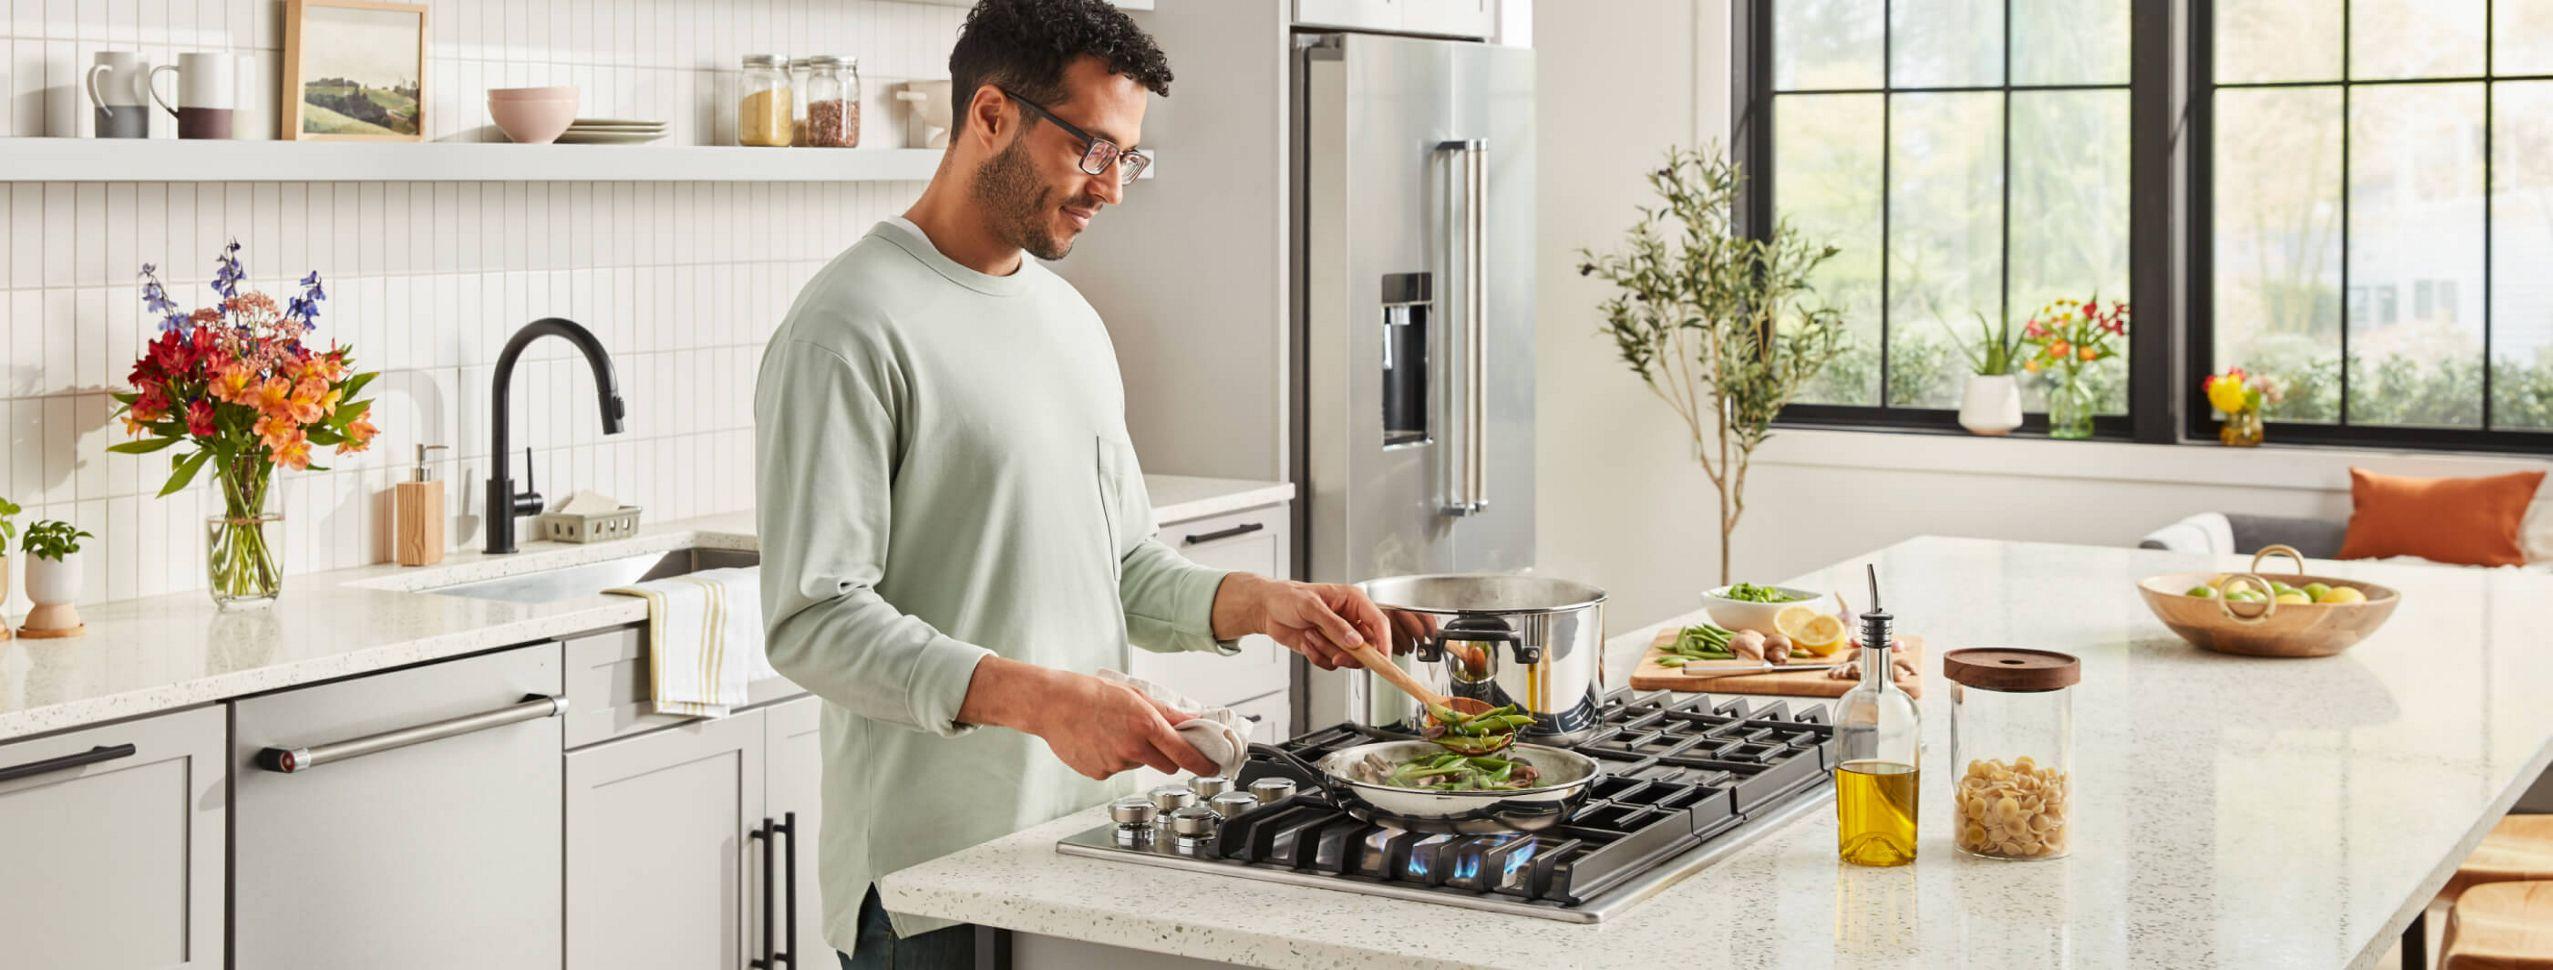 Man in grey shirt standing at KitchenAid® Cooktop sauteing green vegetables.